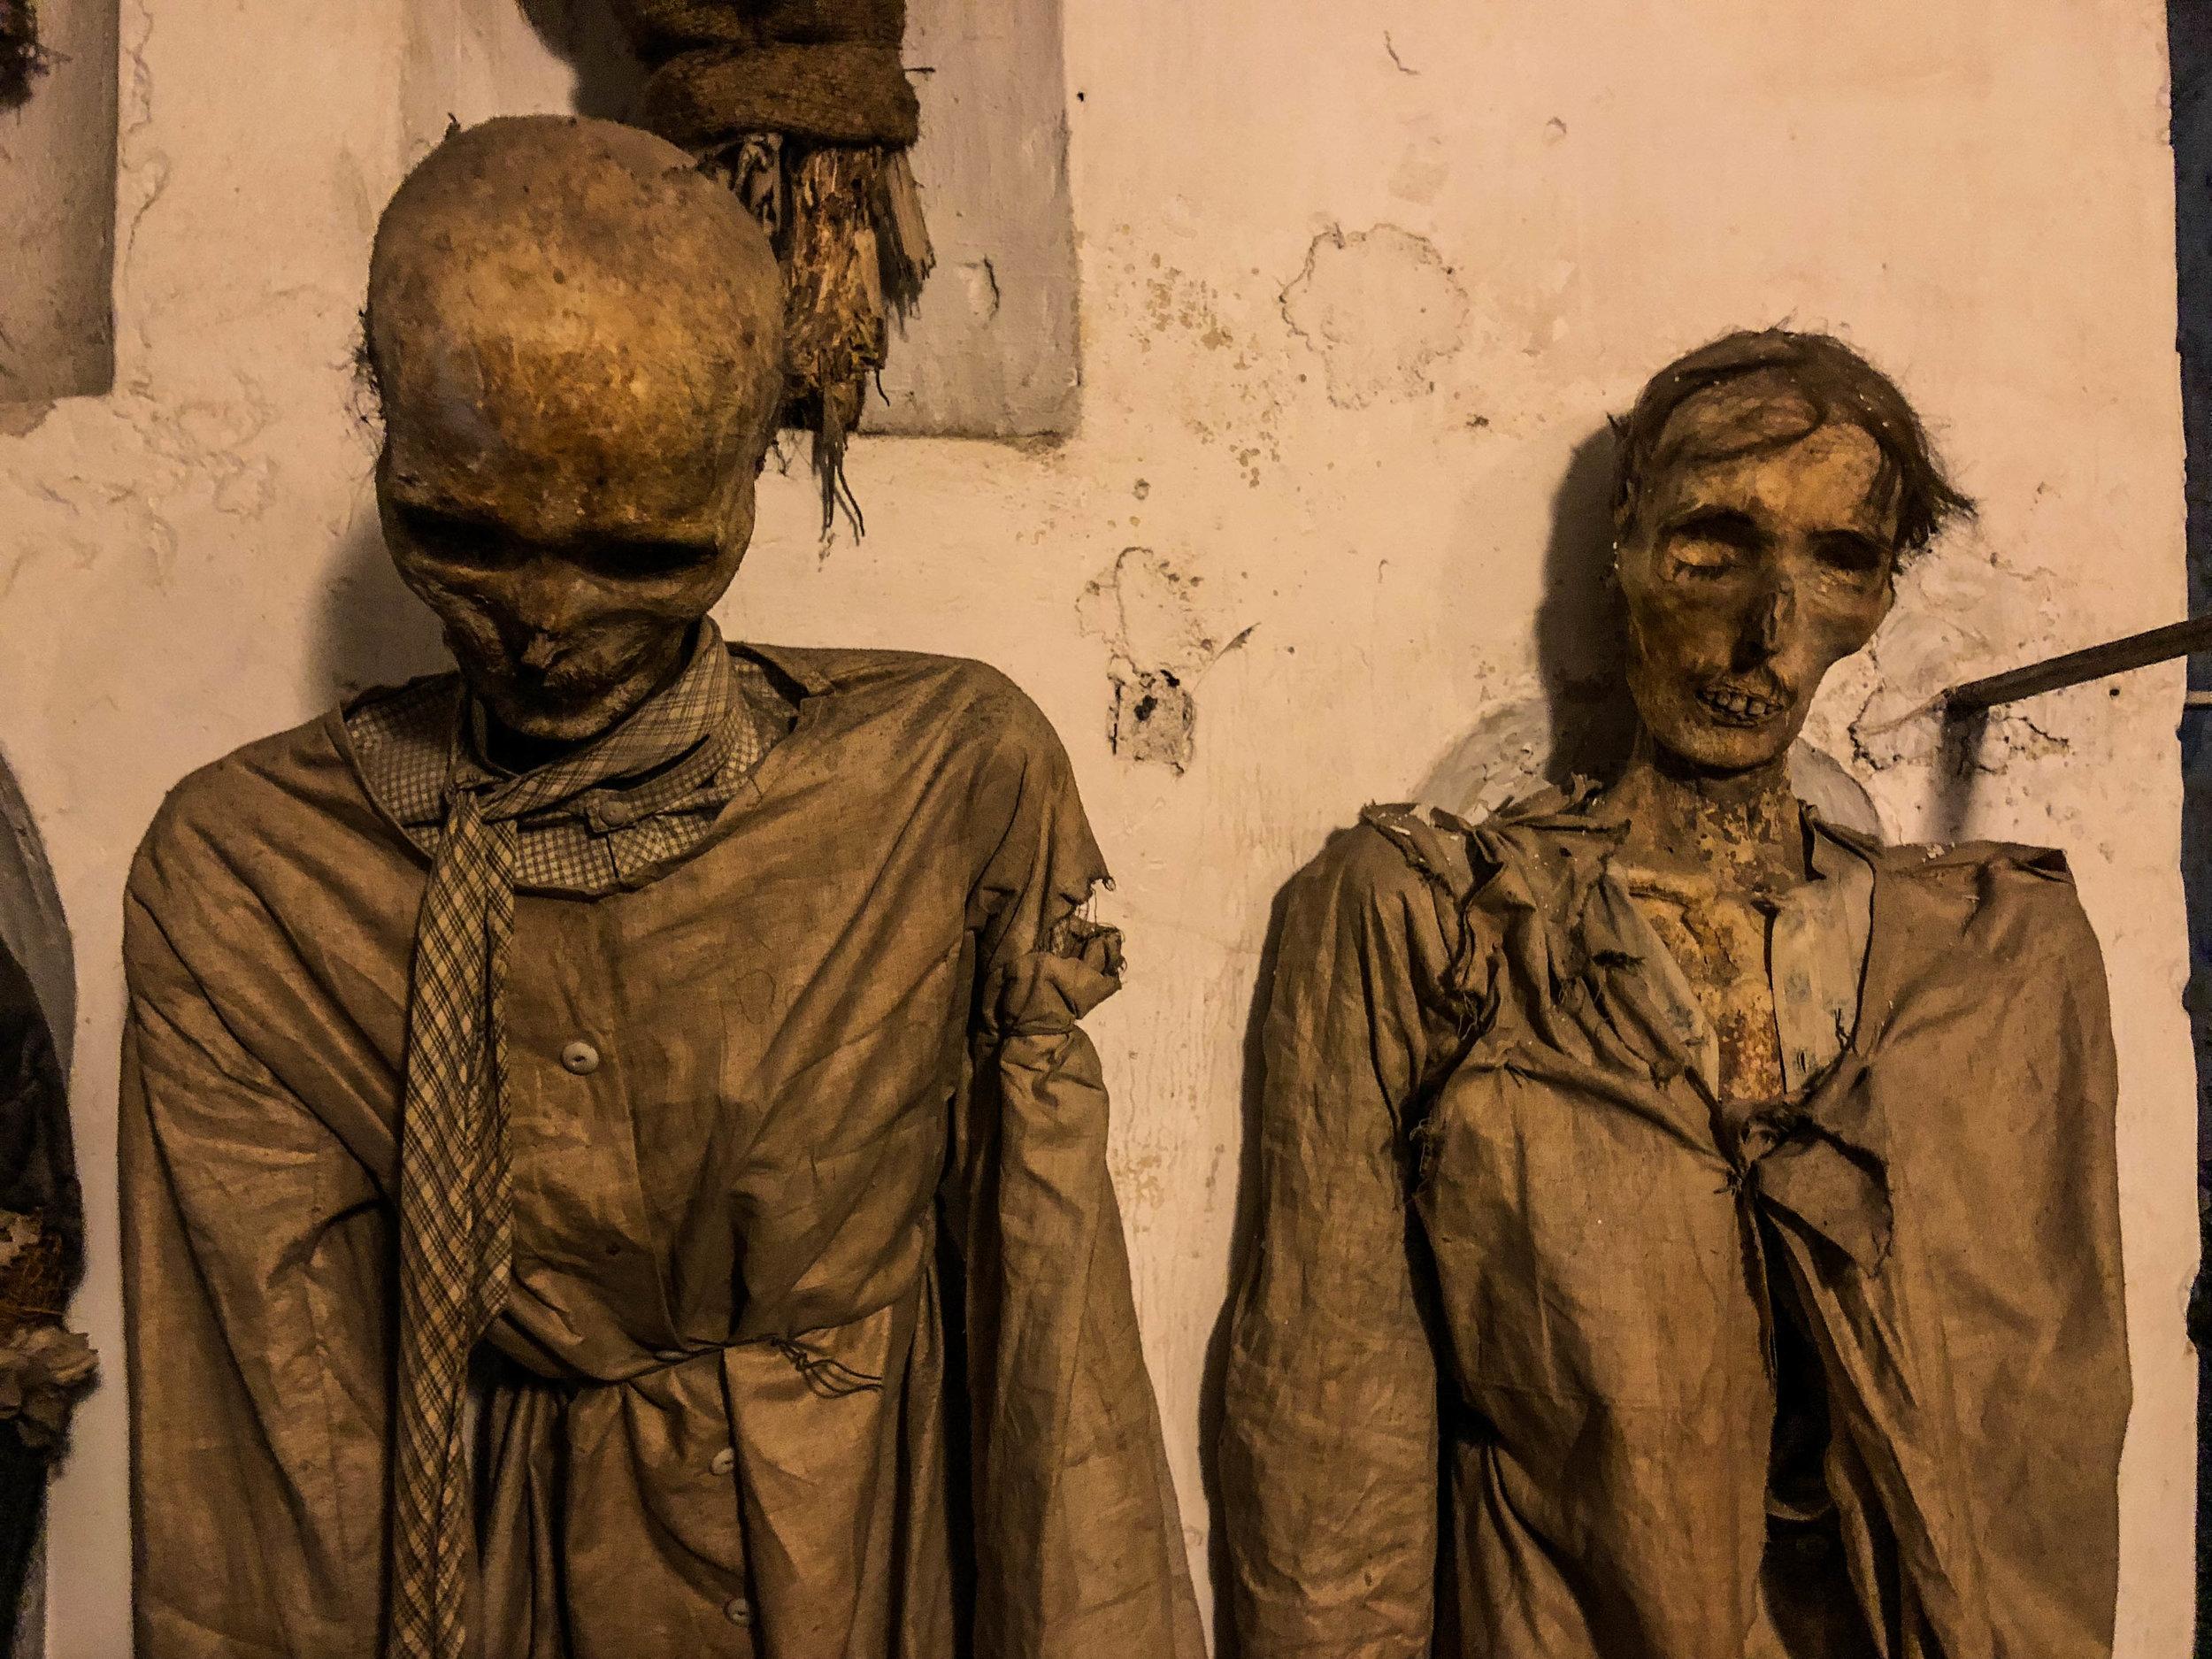 capuchin-catacombs-bodies-palermo-10.jpg